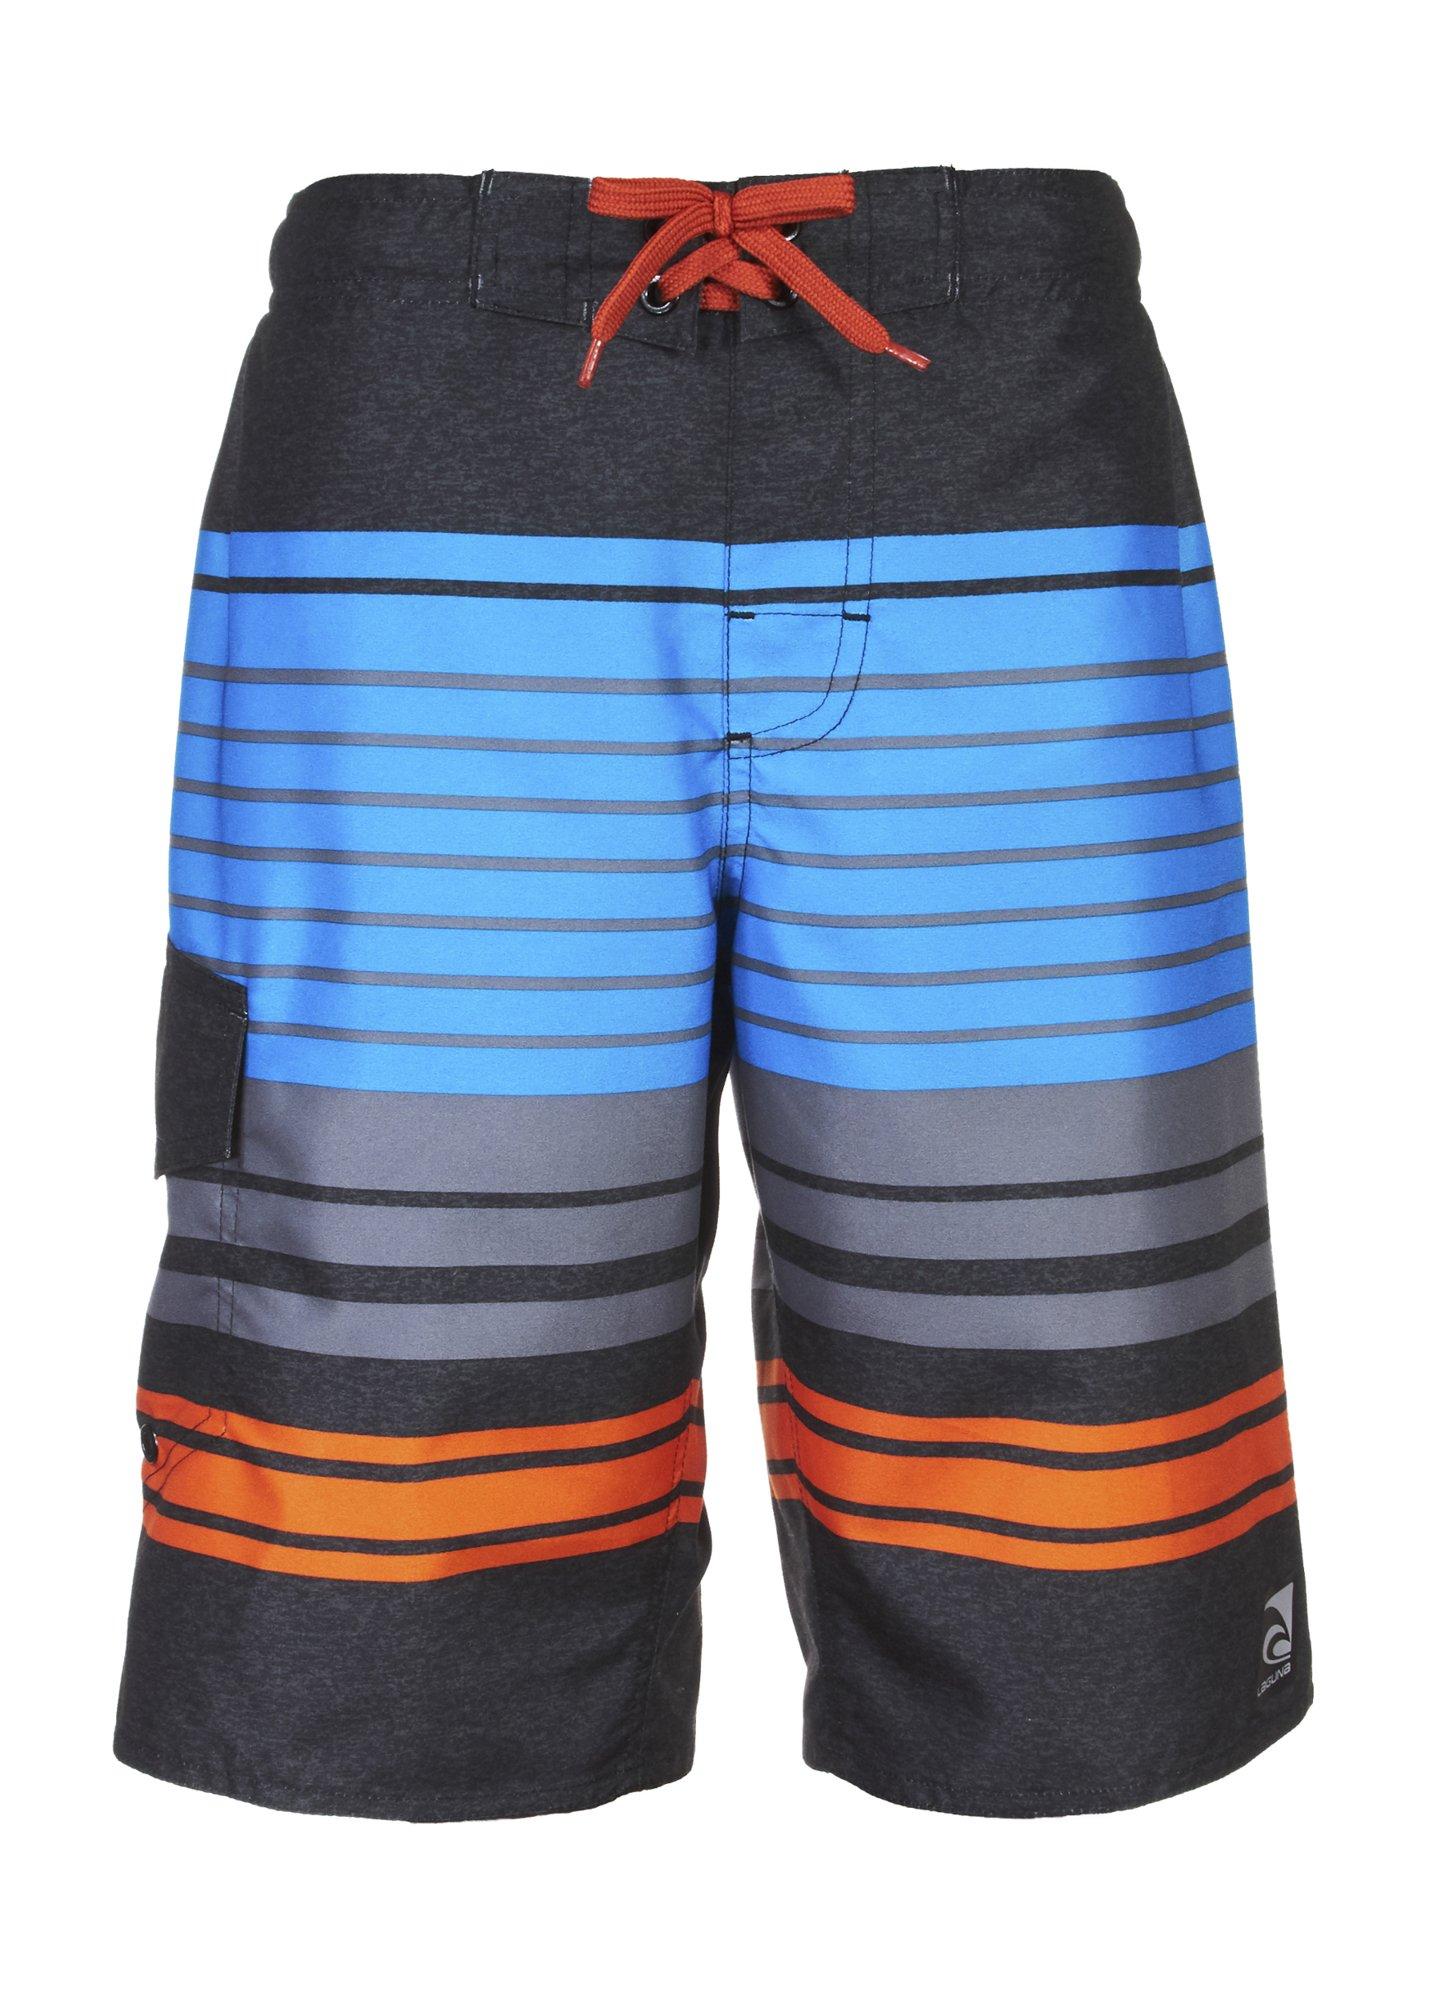 Laguna Boys Impact Zone Swim Trunk Charcoal Combo 10/12